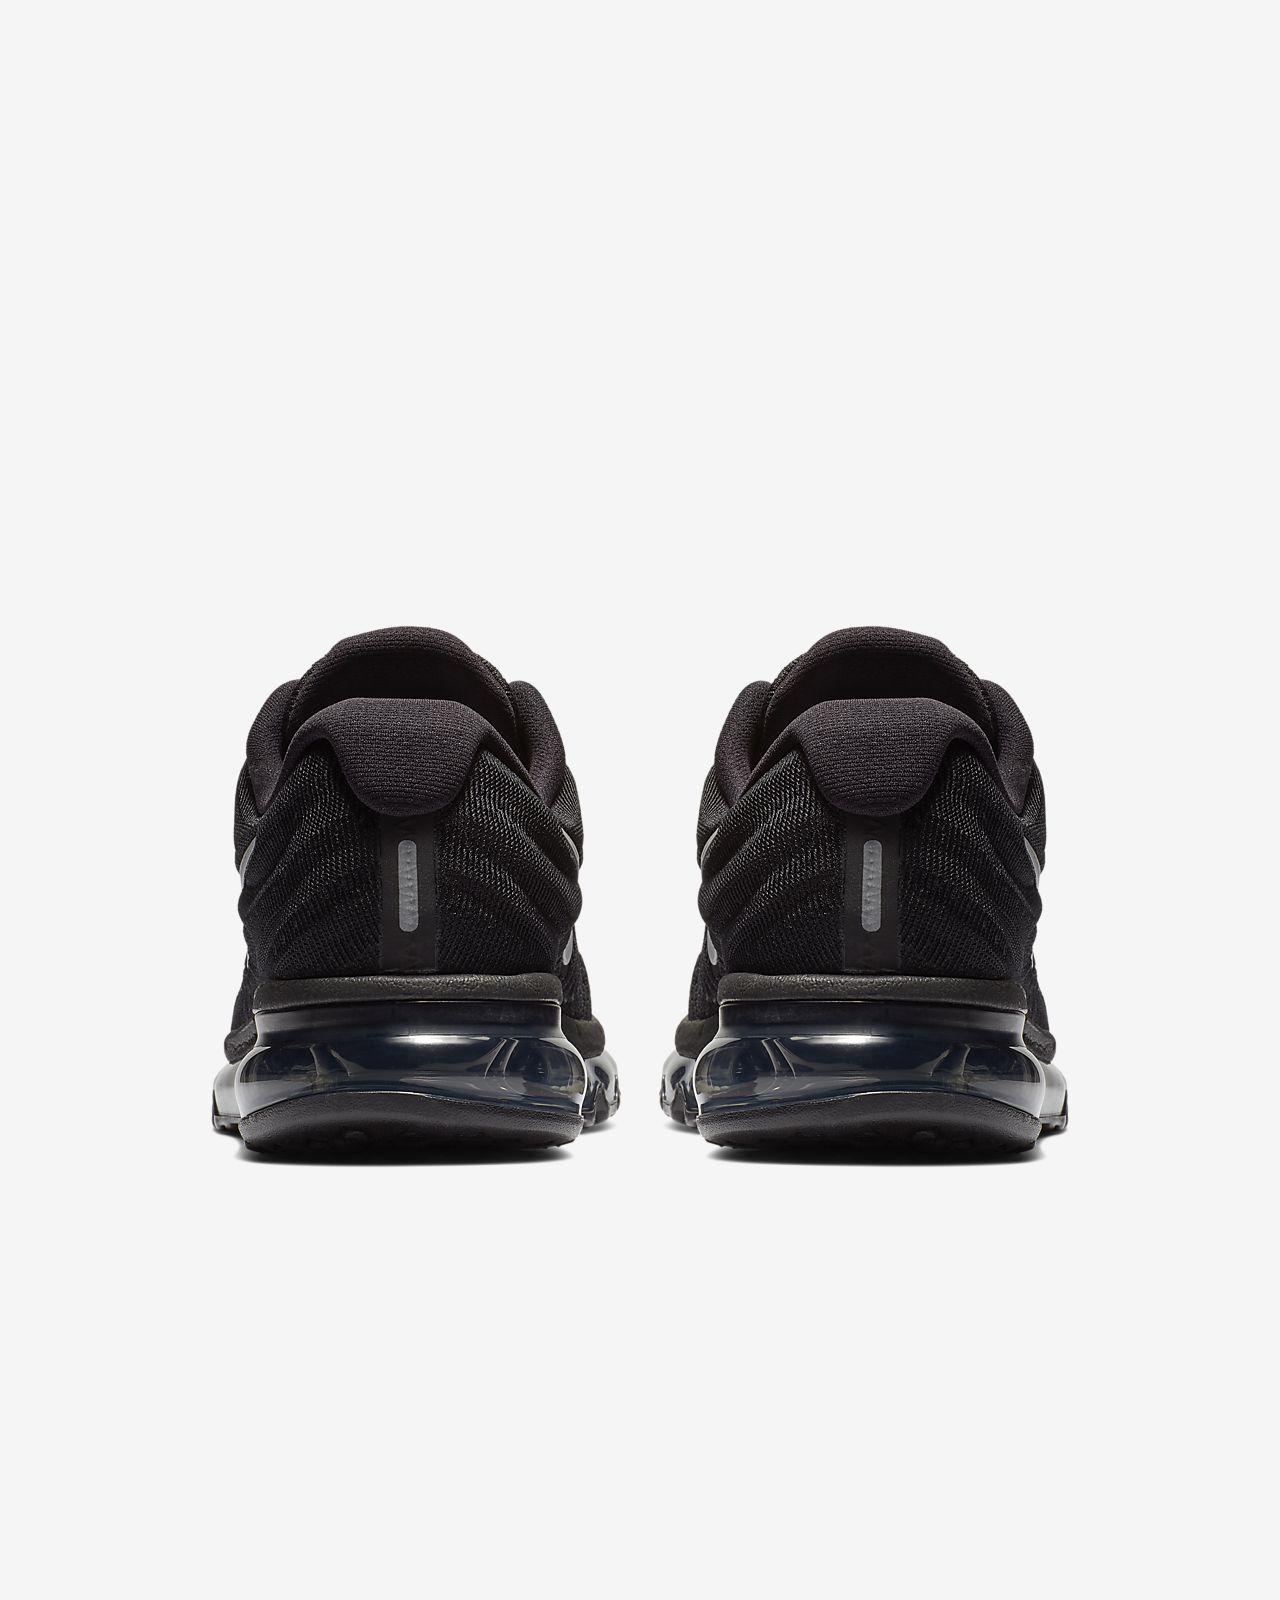 Kicks Deals – Official Website Nike Air Max 2017 BlackPalm